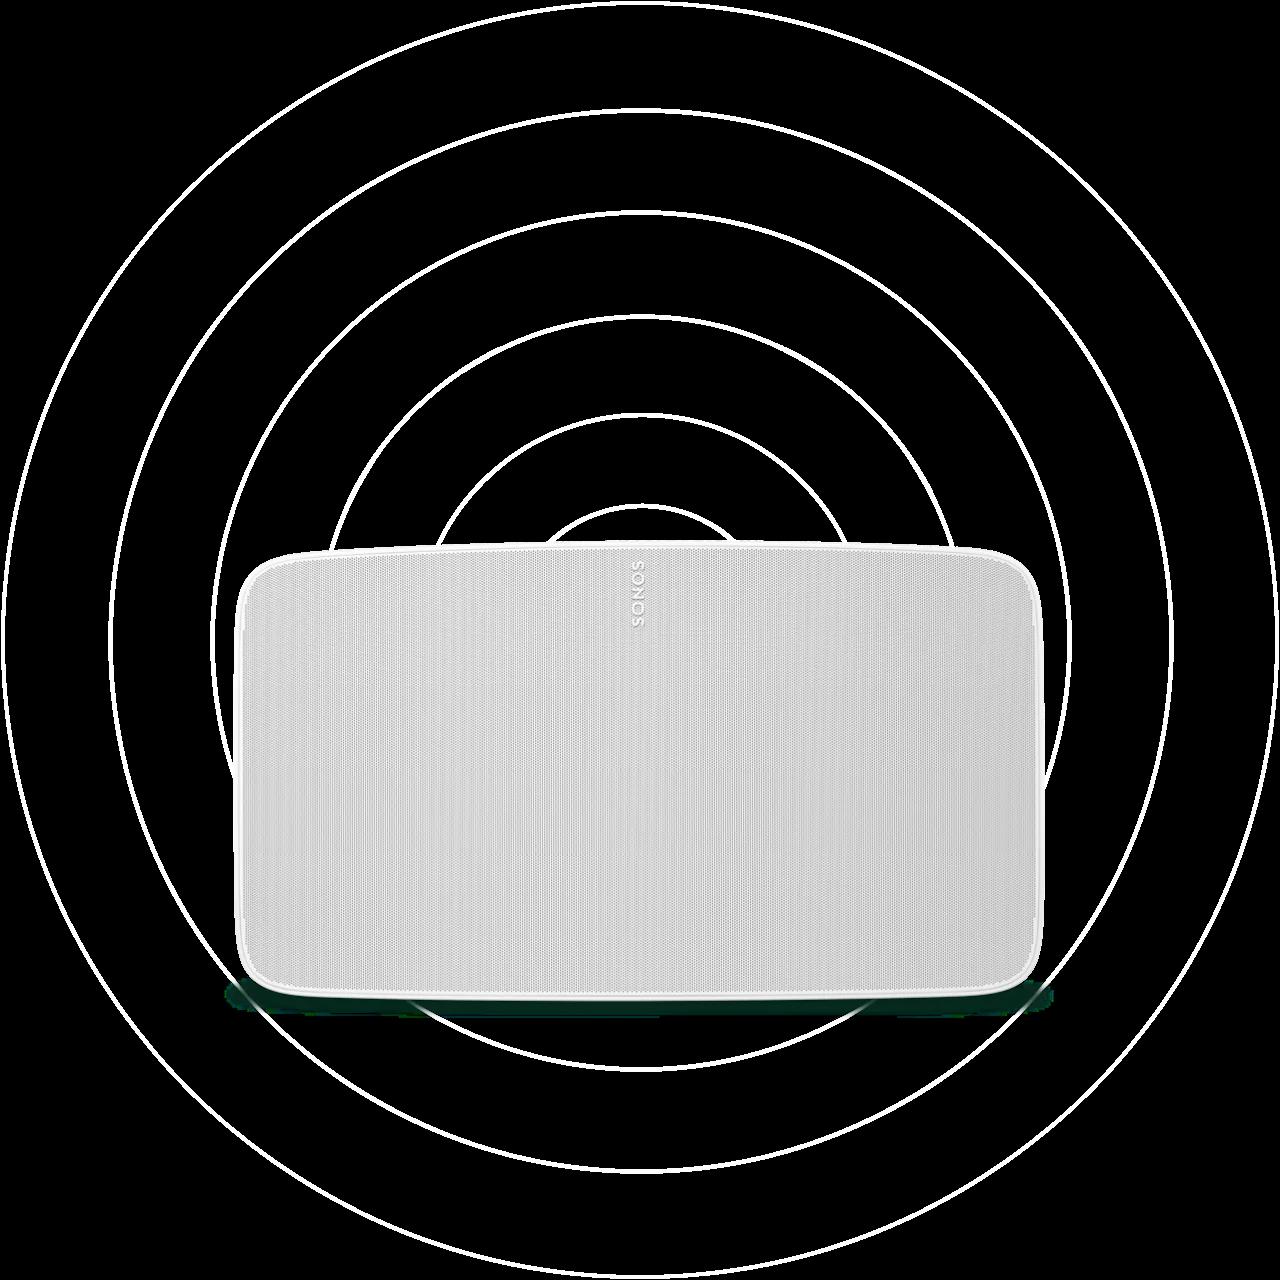 five-front-horizontal-white-soundwaves